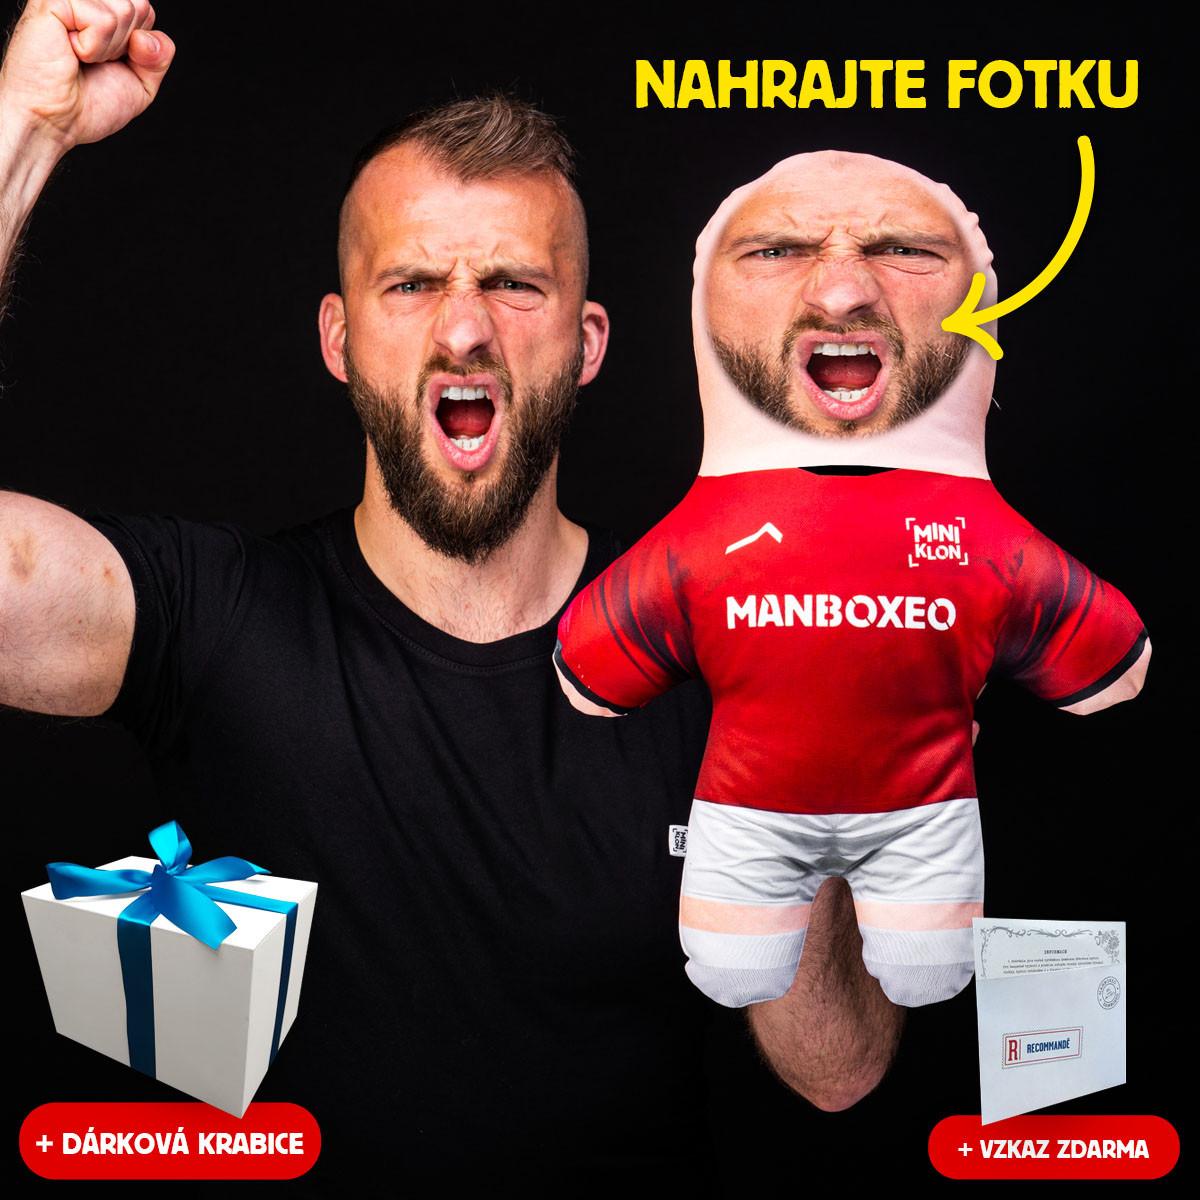 MiniKlon Rudý fotbalista v dárkové krabici